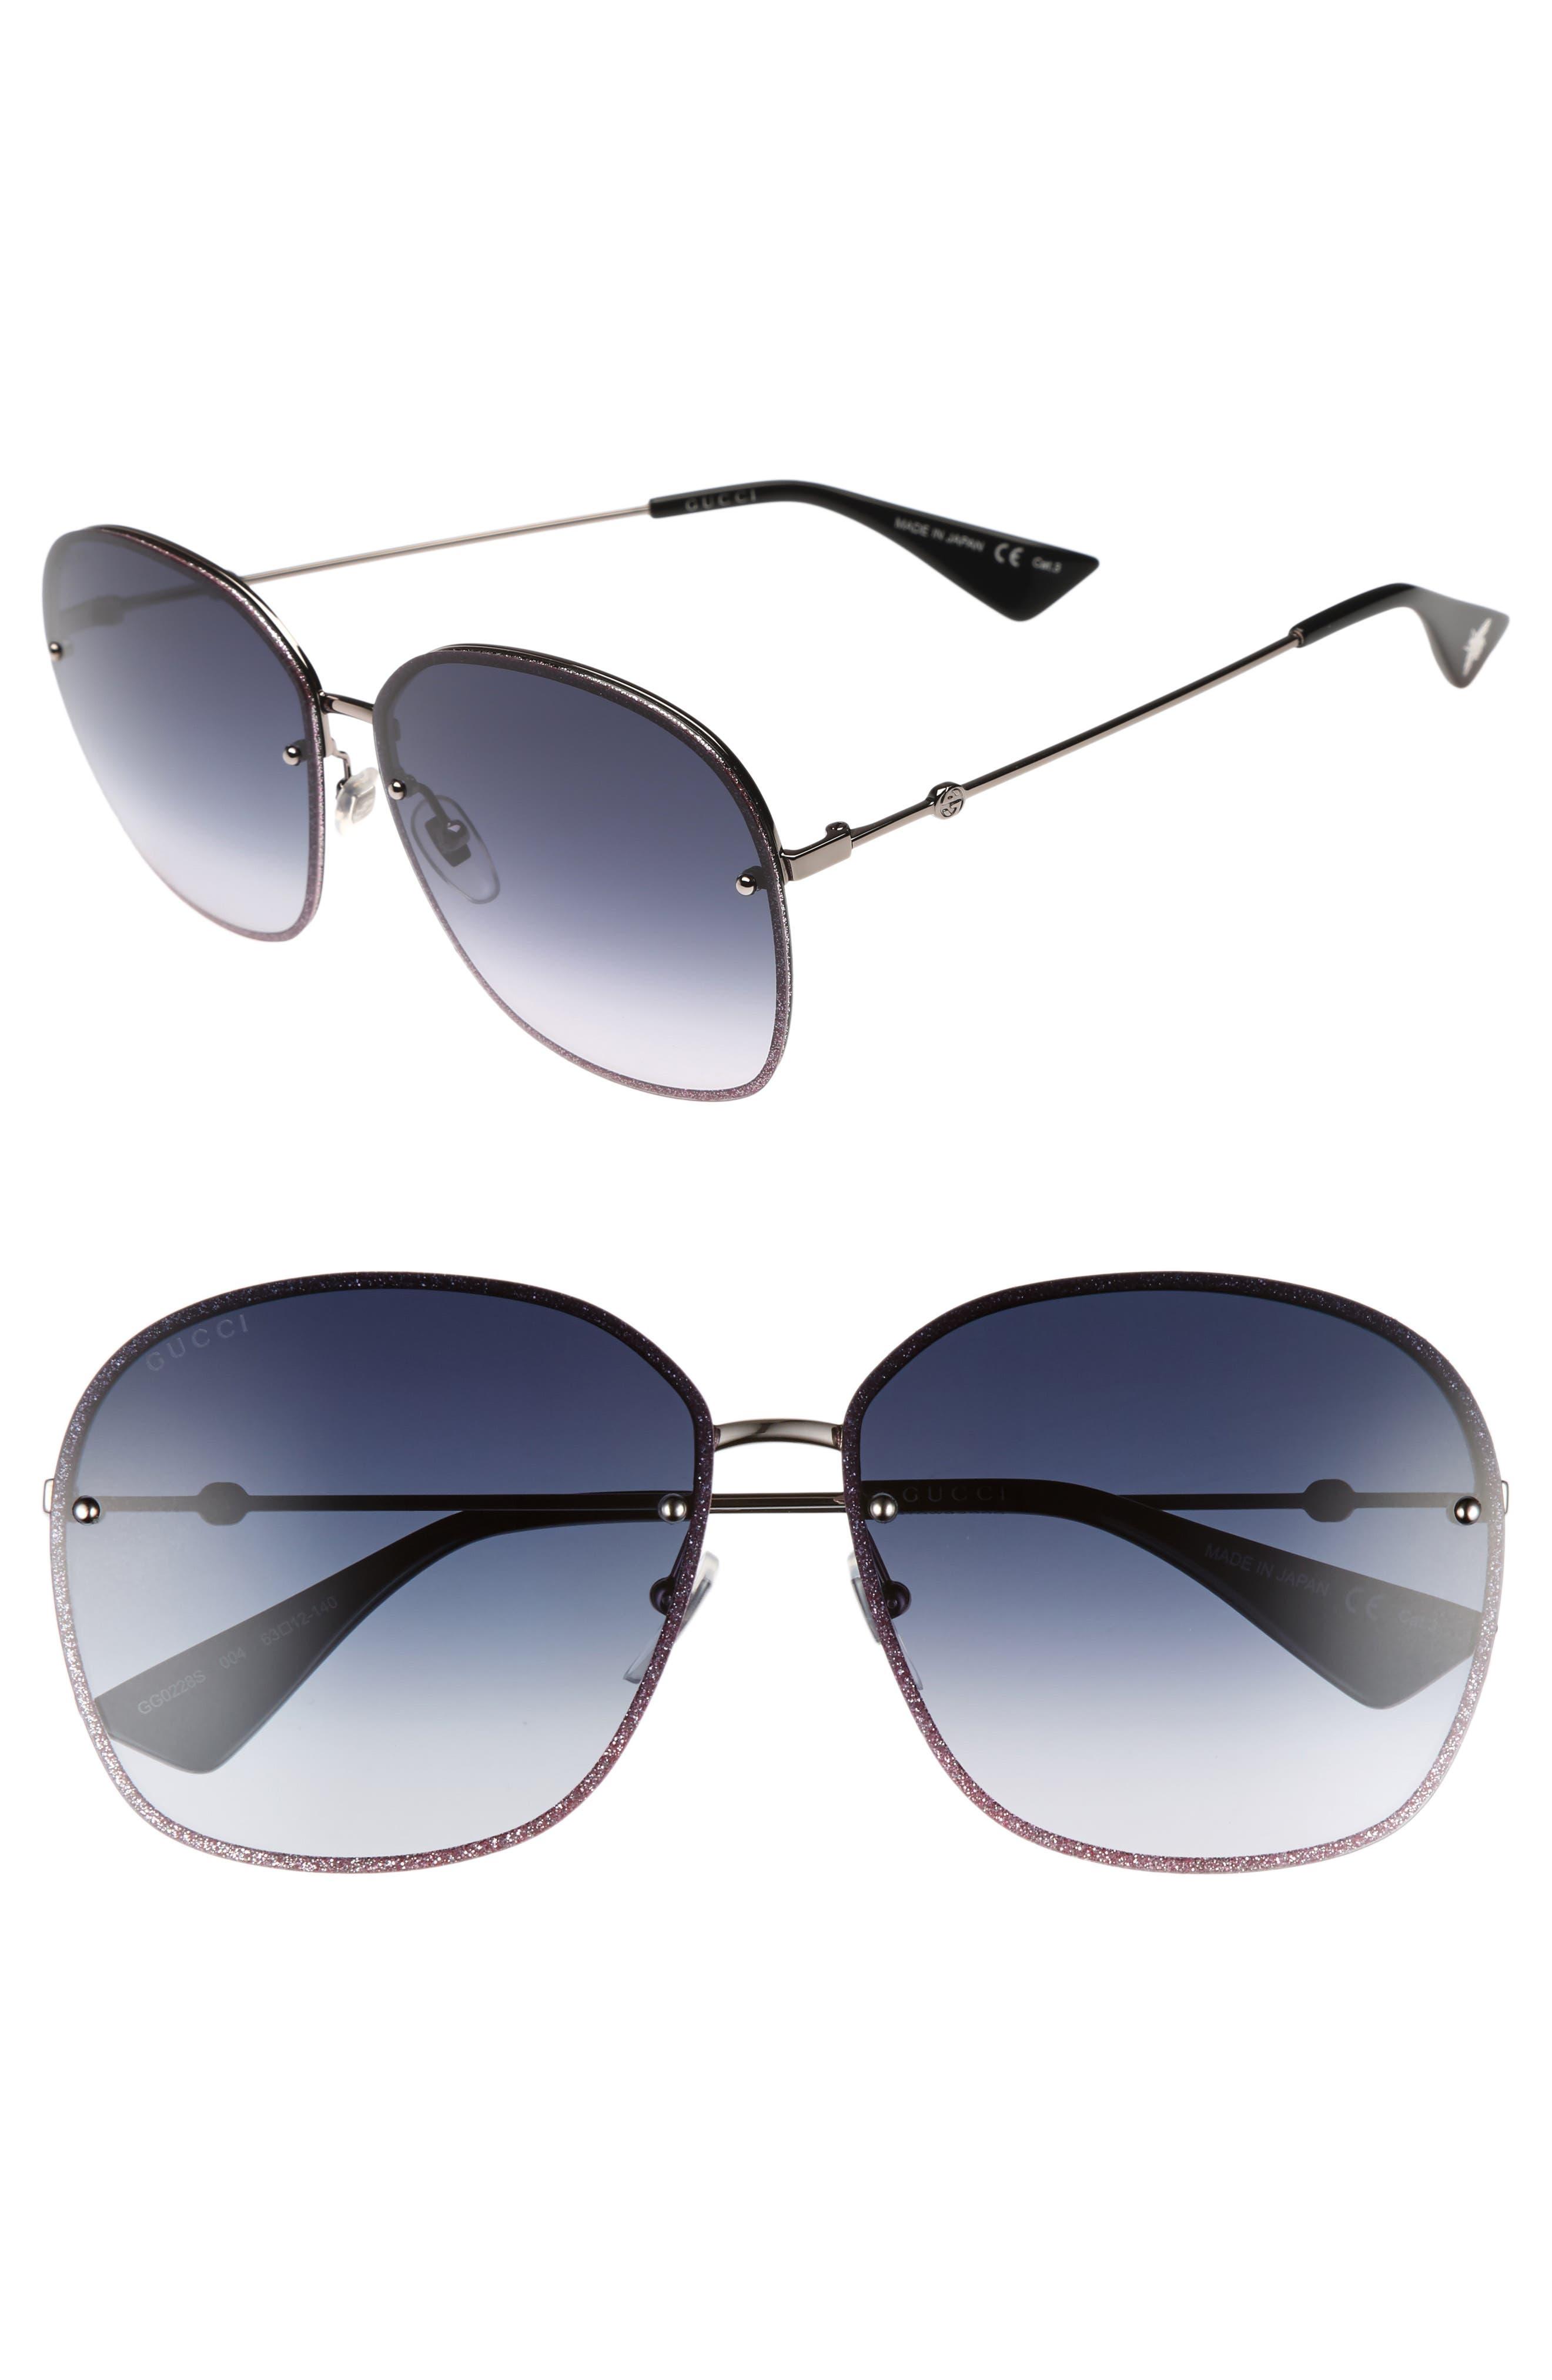 GUCCI,                             63mm Oversize Square Sunglasses,                             Main thumbnail 1, color,                             040